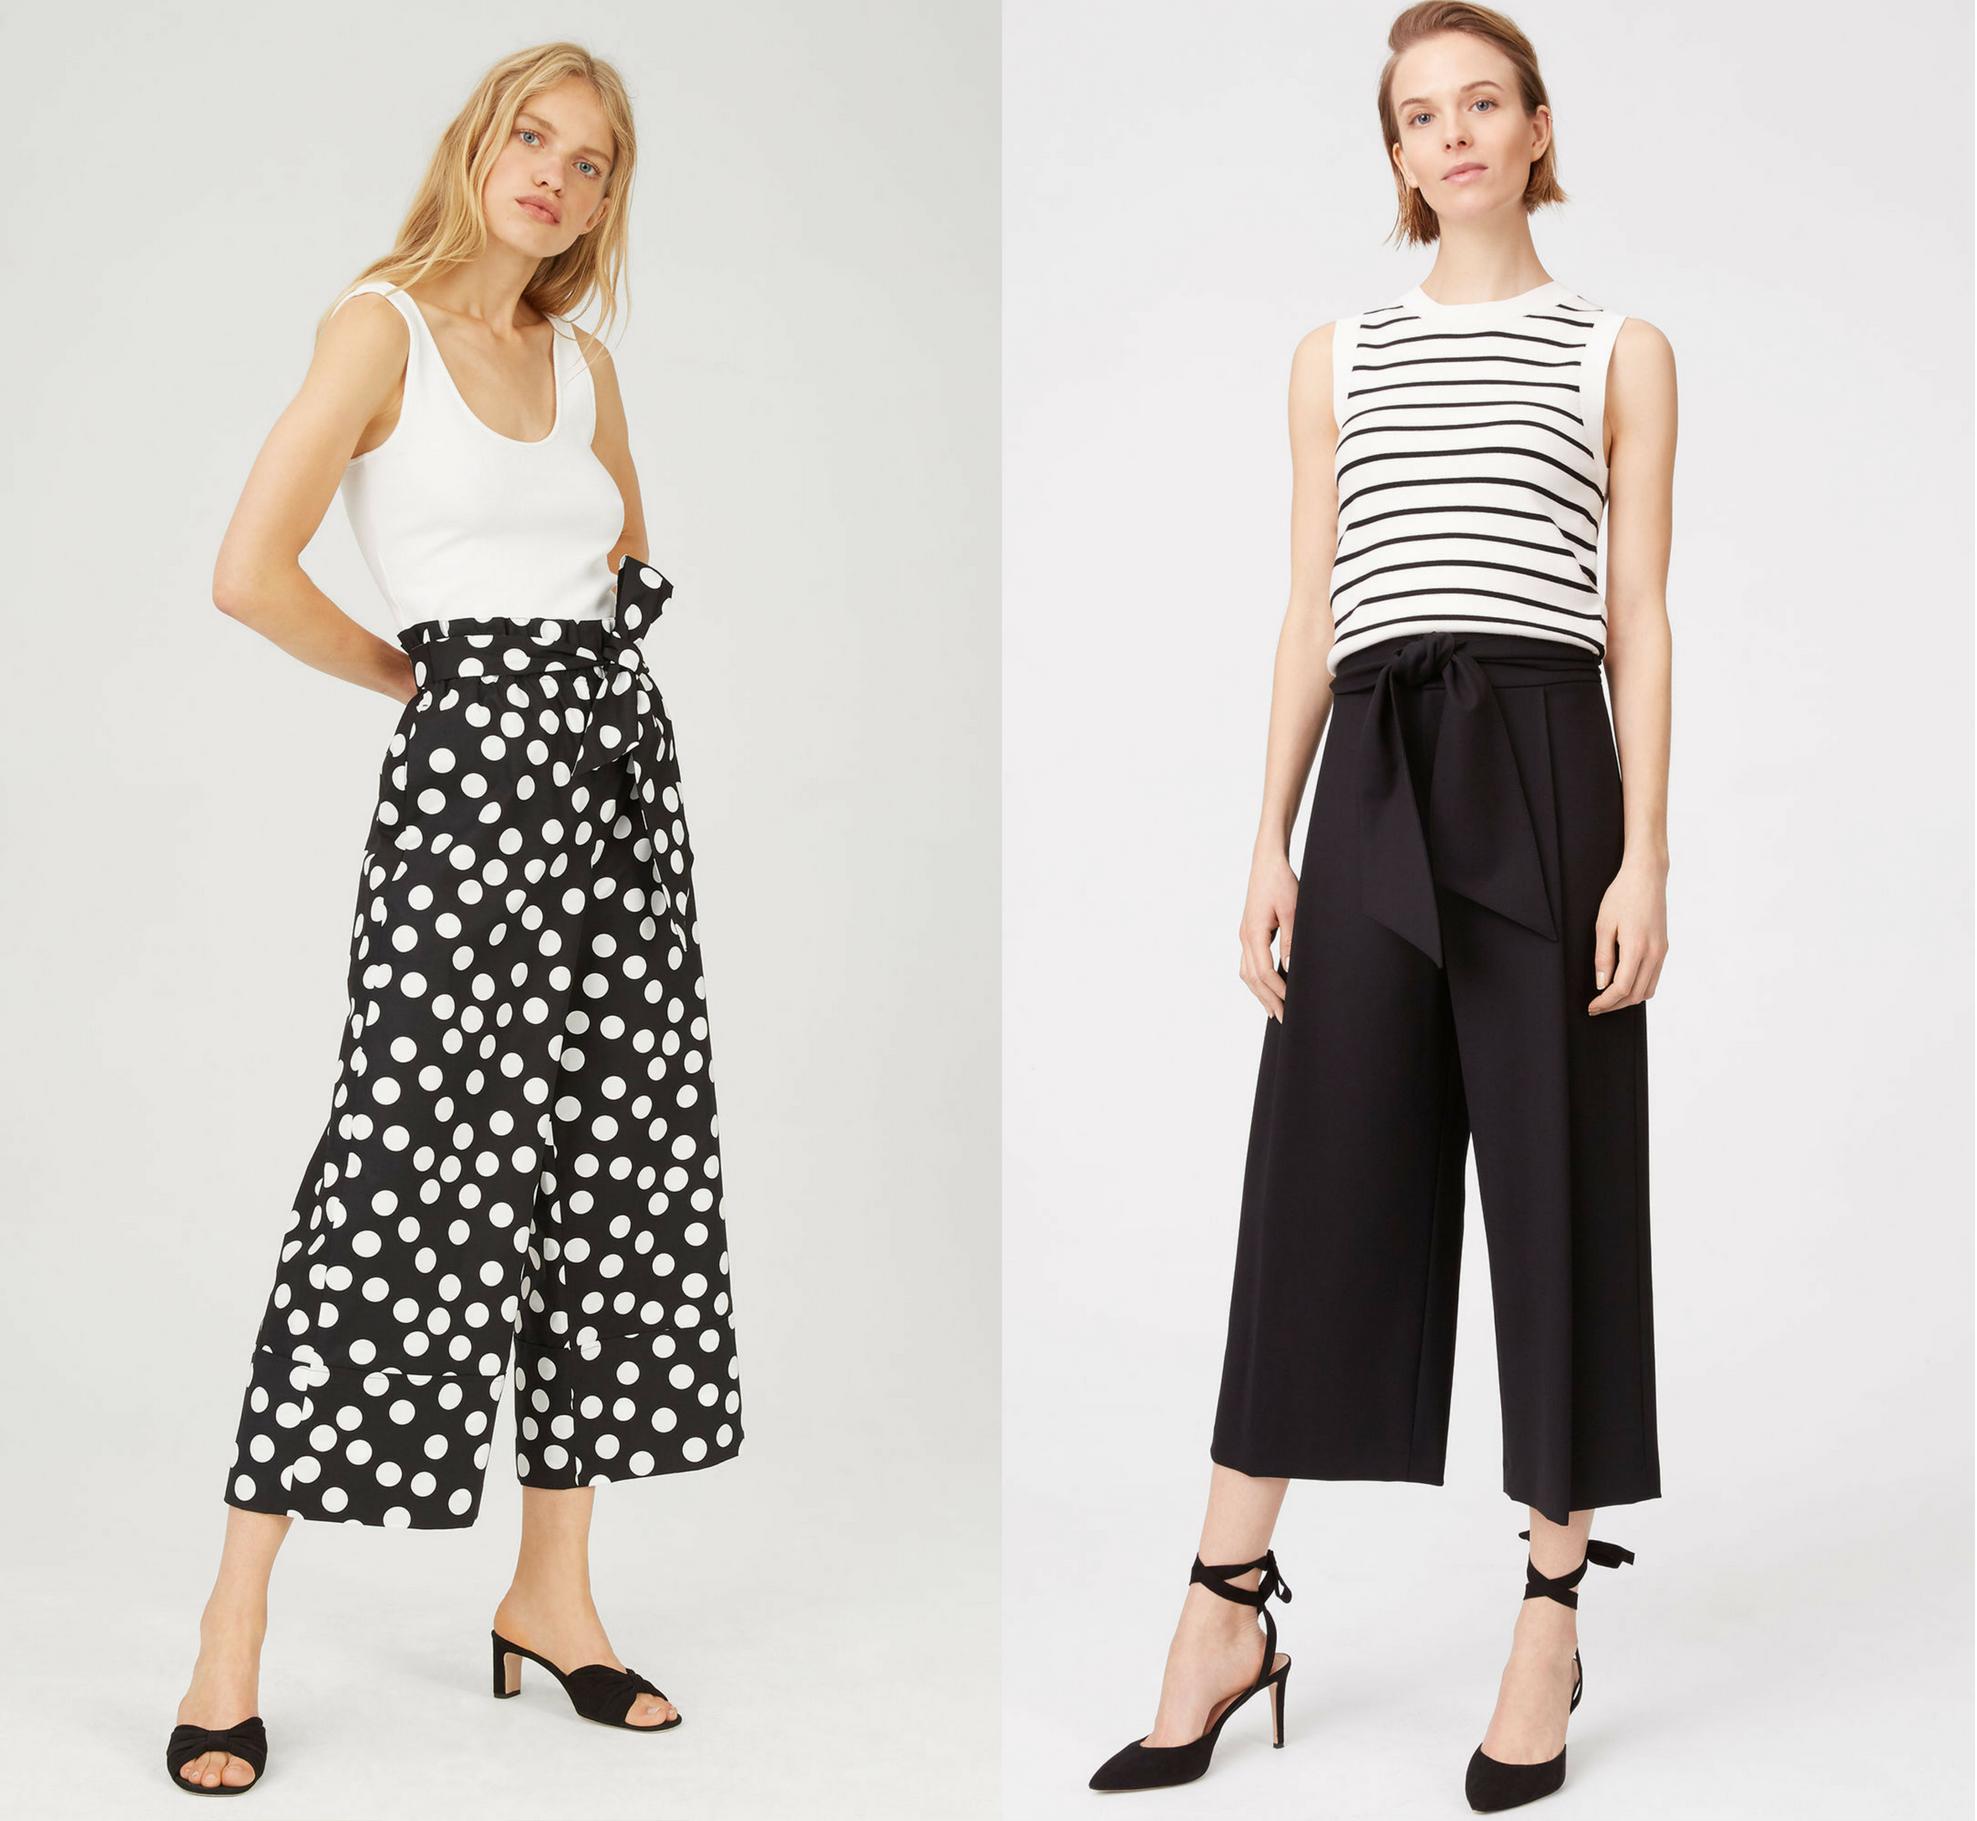 shop the look - Club Monaco- Izabelah Pant (right)Aladorah Pant (right)